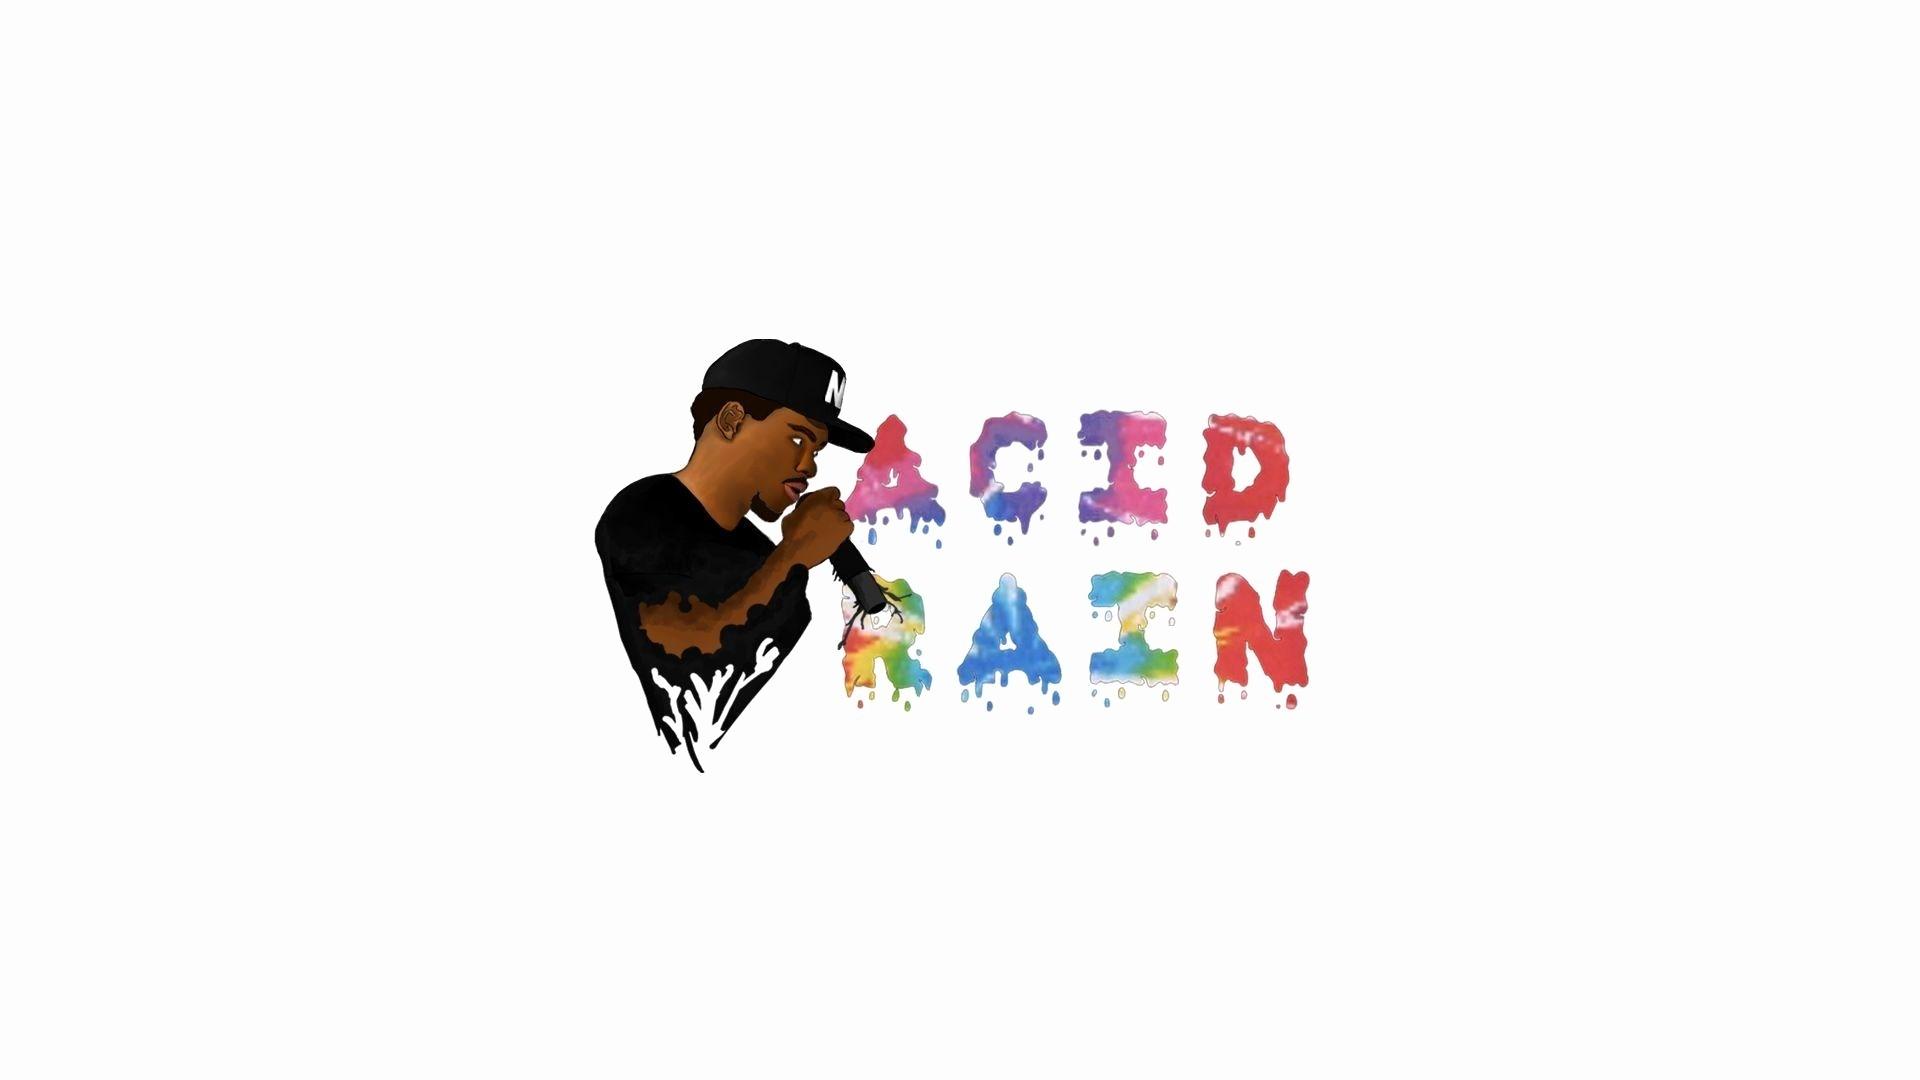 Chance The Rapper hd wallpaper download